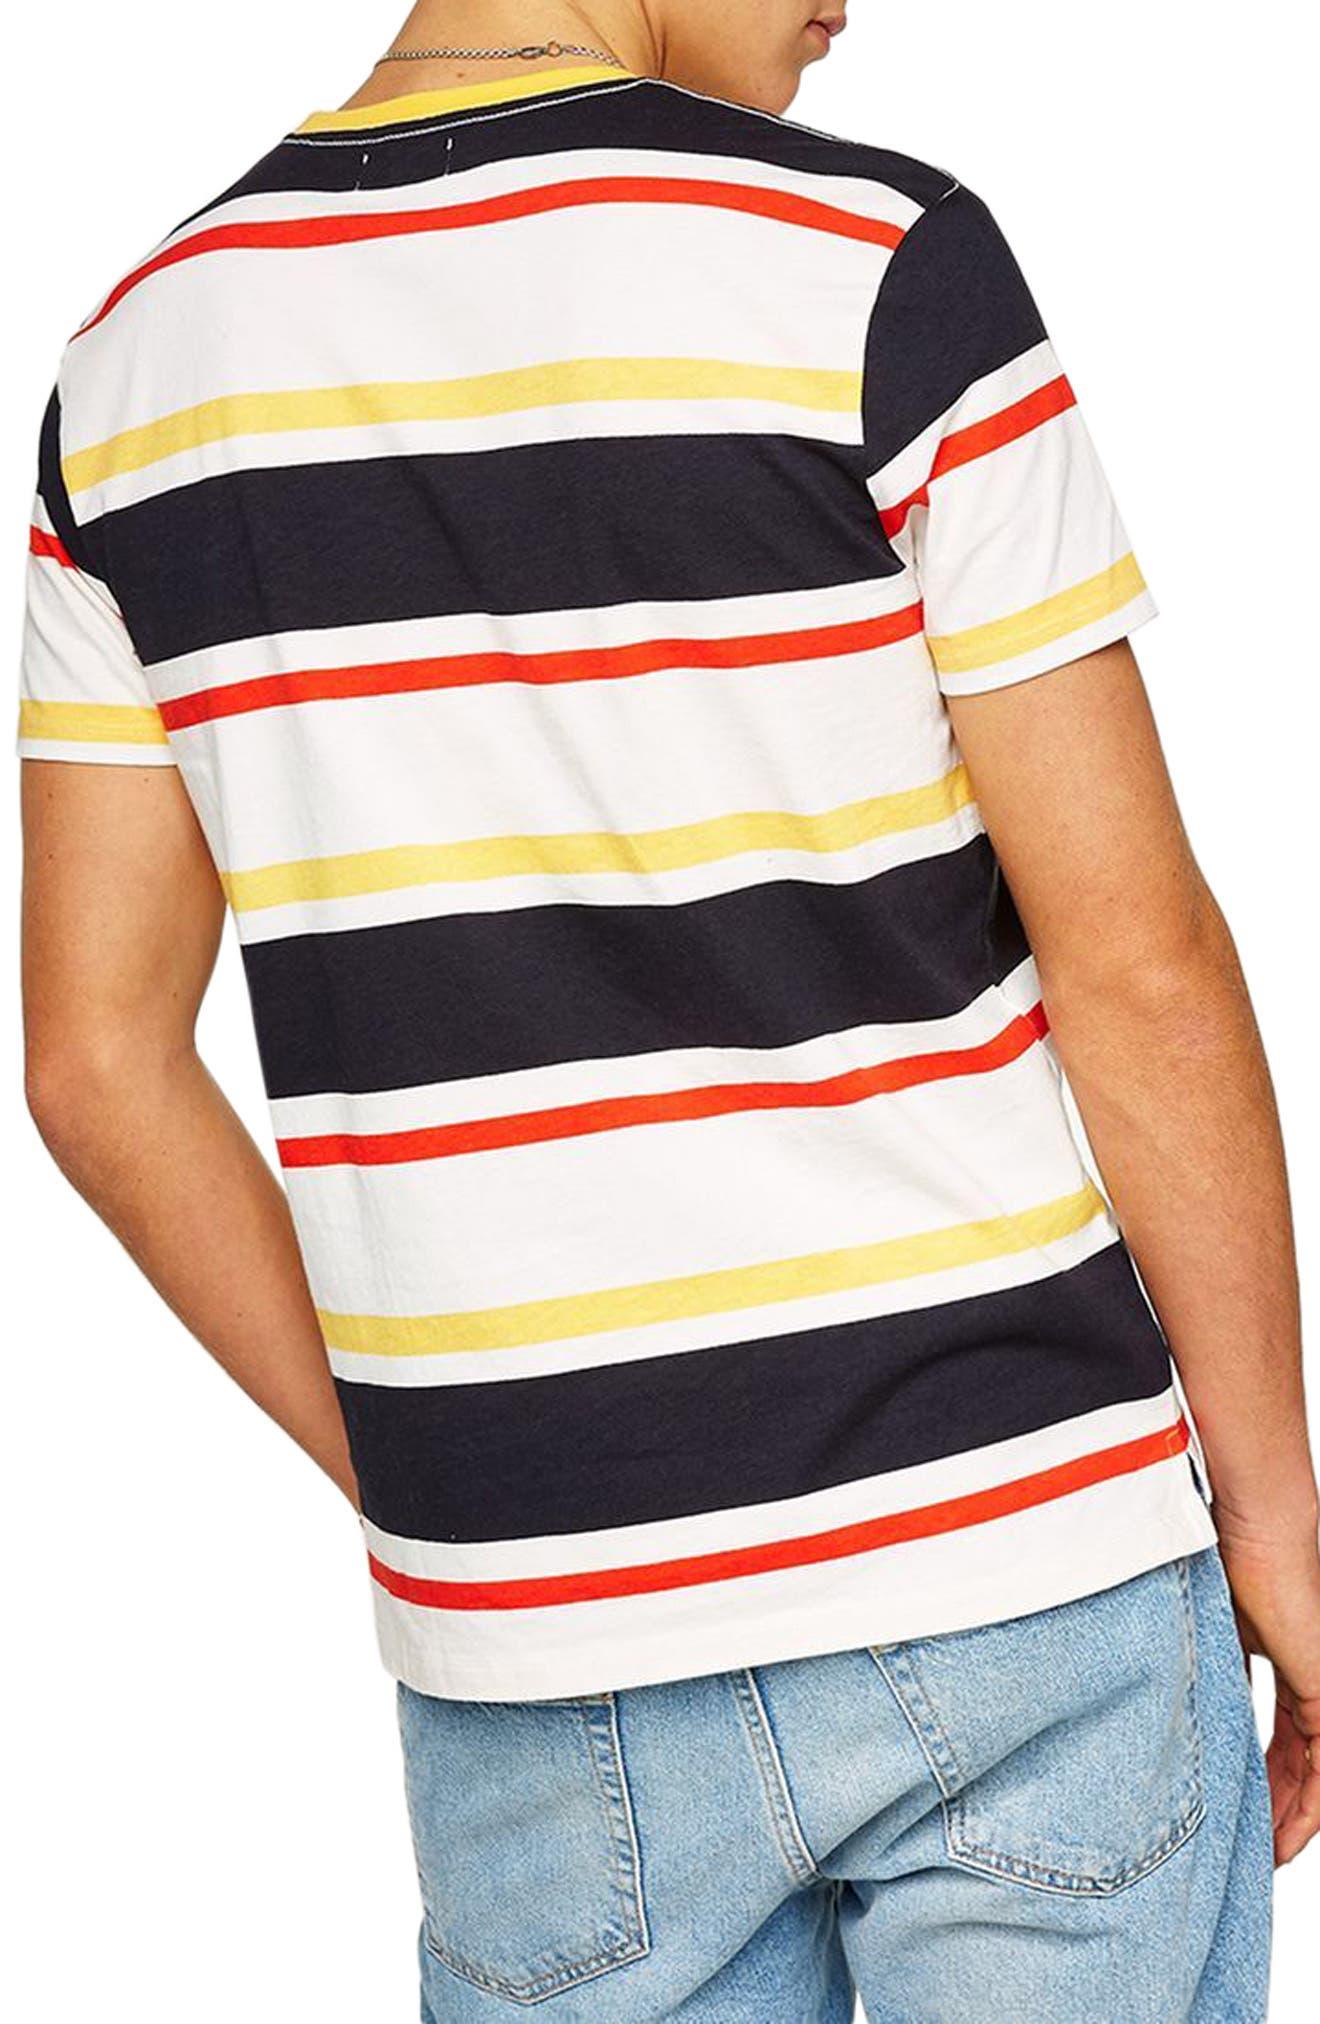 Slim Fit Stripe T-Shirt,                             Alternate thumbnail 2, color,                             Yellow Multi